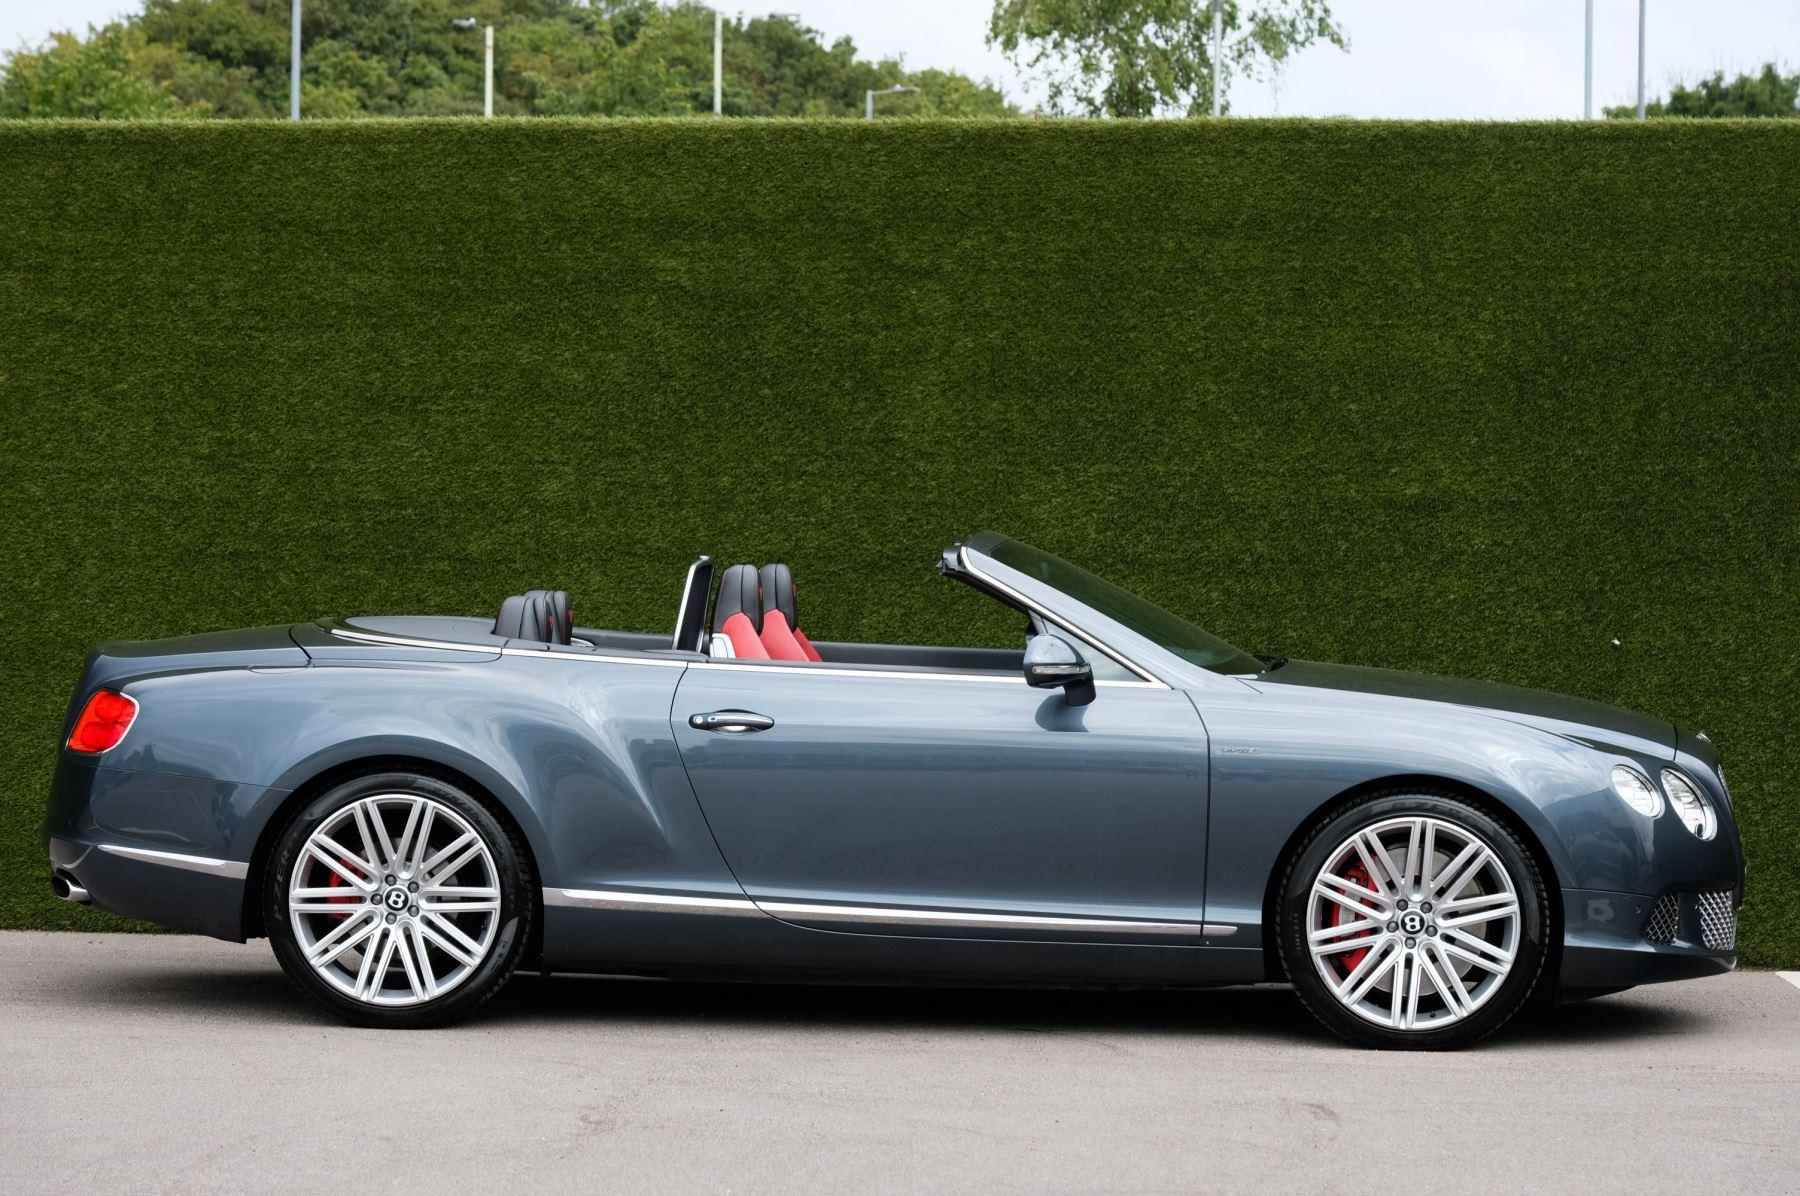 Bentley Continental GTC 6.0 W12 Speed - Massage Seats & Ventilation - Neck Warmer - Rear View Camera image 3